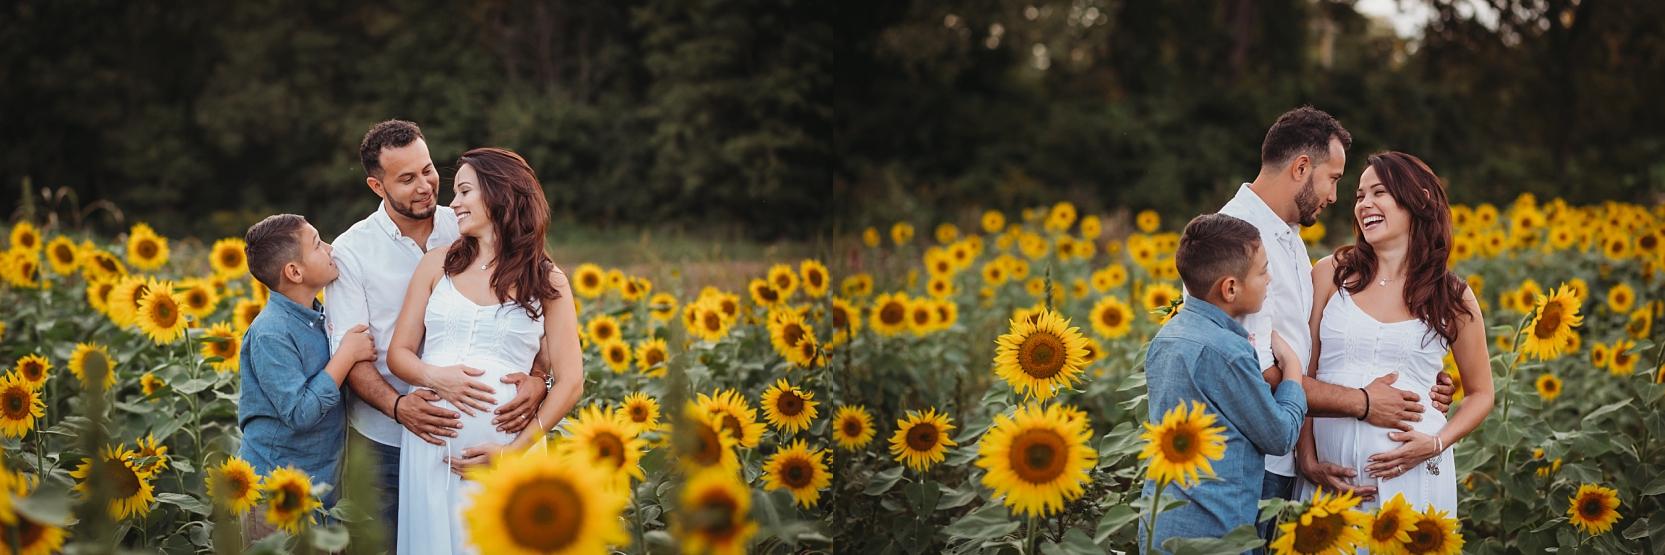 potomac-md-sunflower-field-maternity-photographer